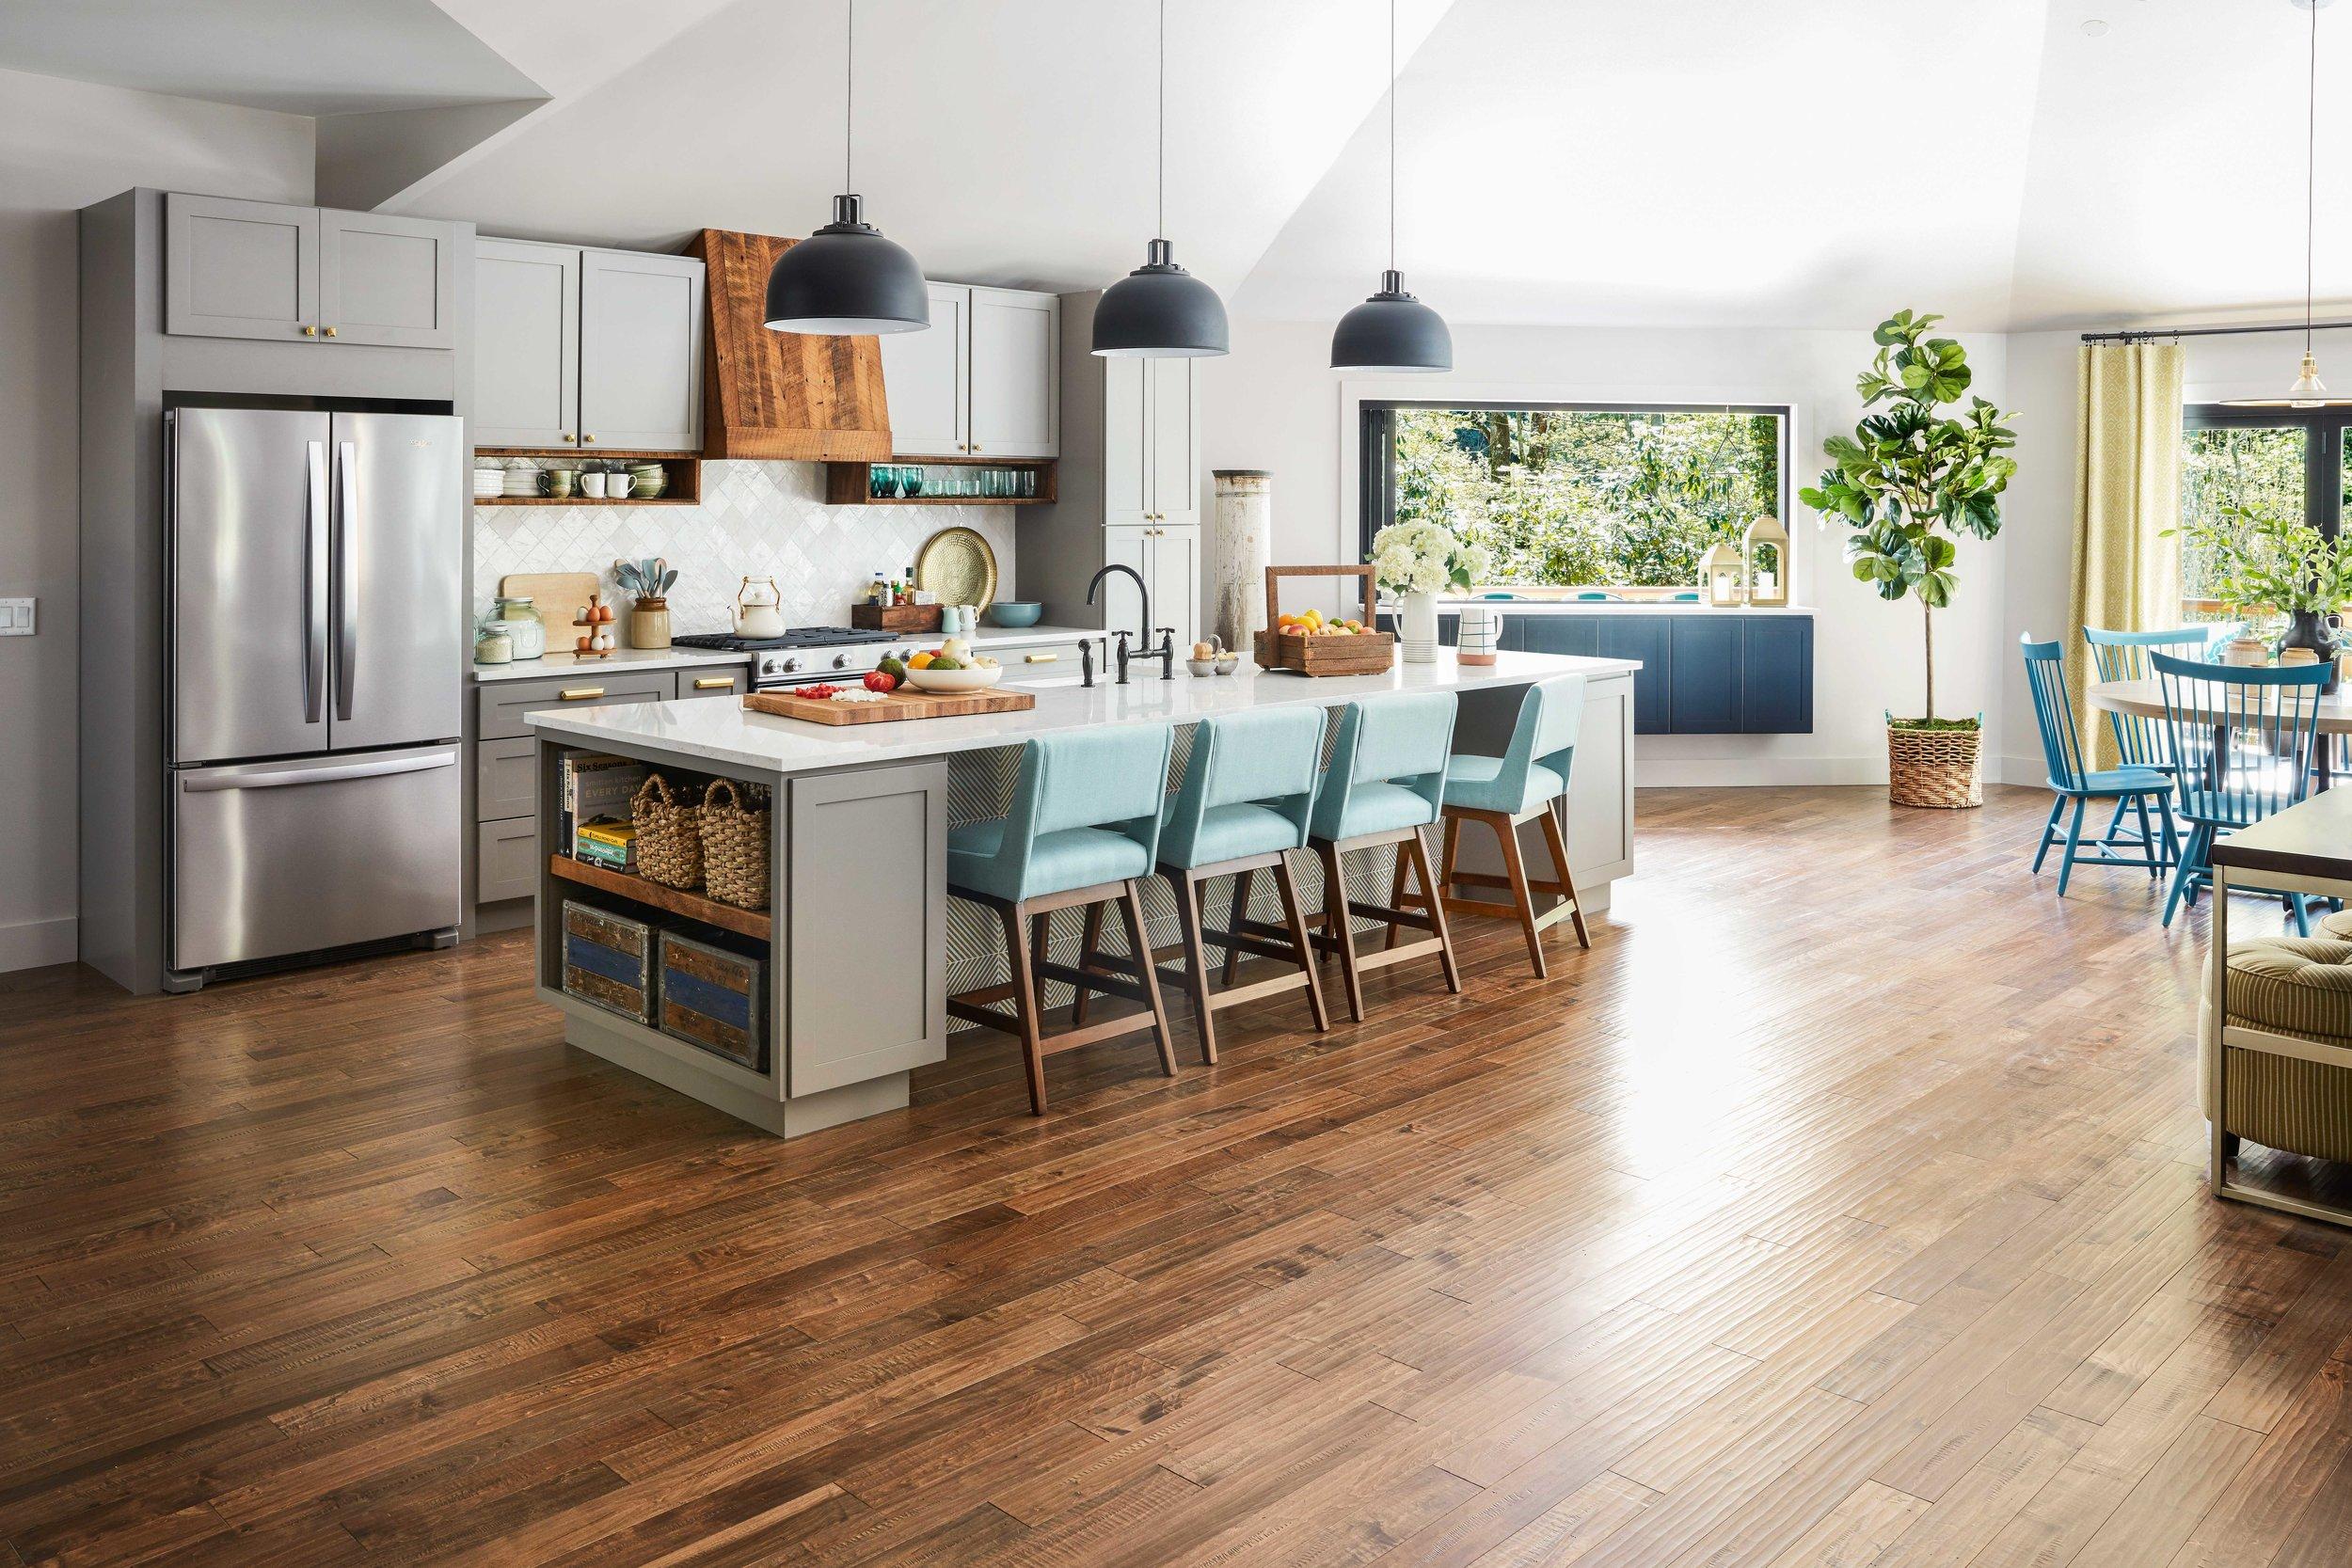 ur2018_kitchen-30-super-wide-from-front-door-Shot_03_092_h-2.jpeg